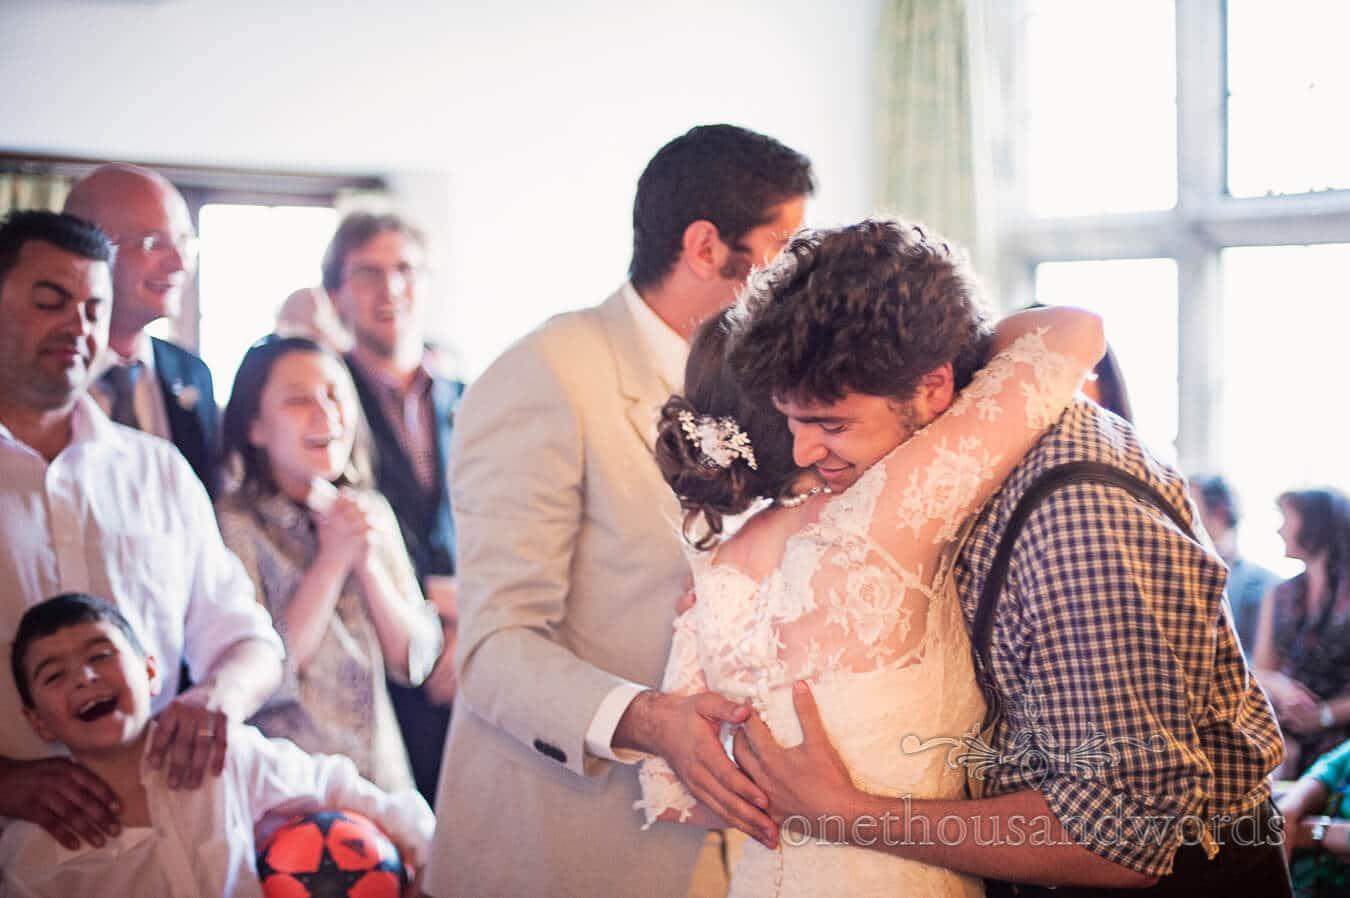 Bride hugs wedding guest at Prussia Cove Wedding venue